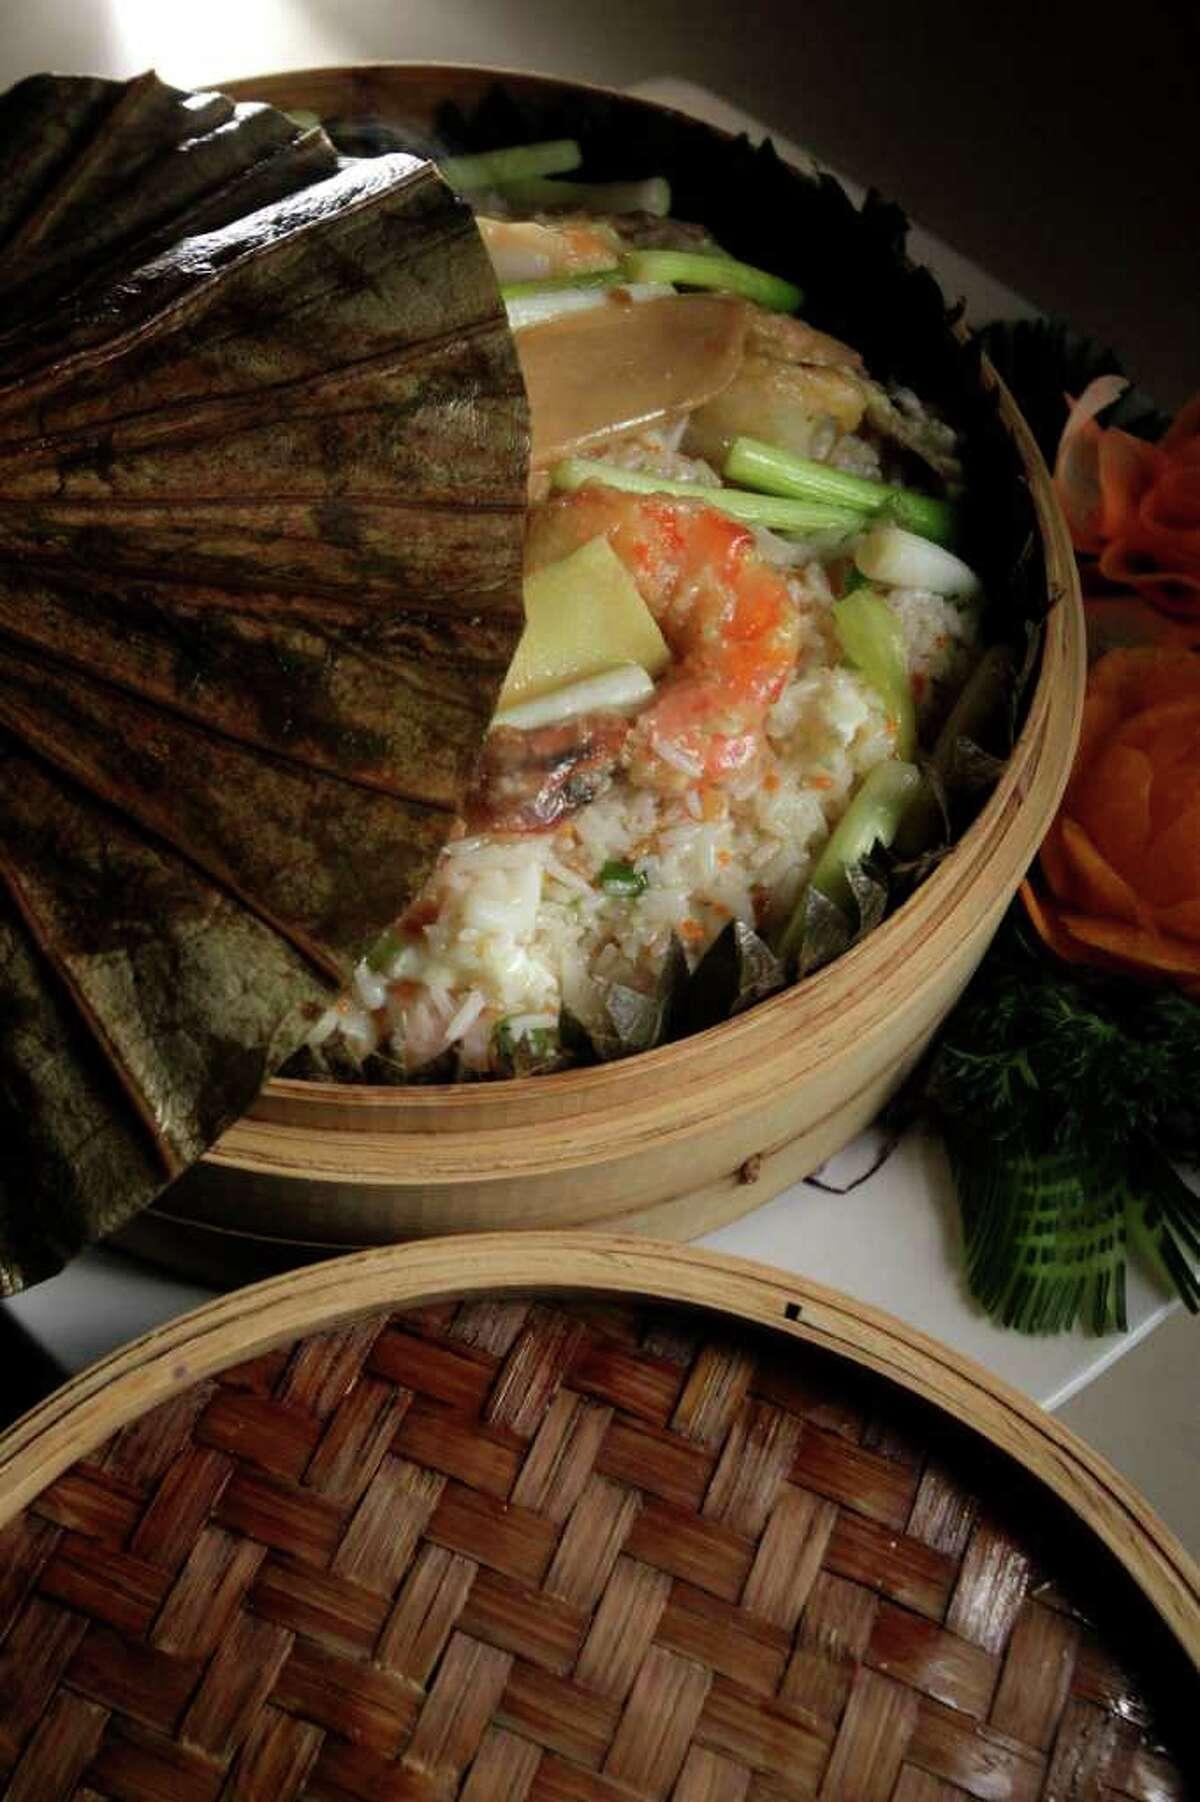 Prawns, seafood fried rice inside a lotus leaf